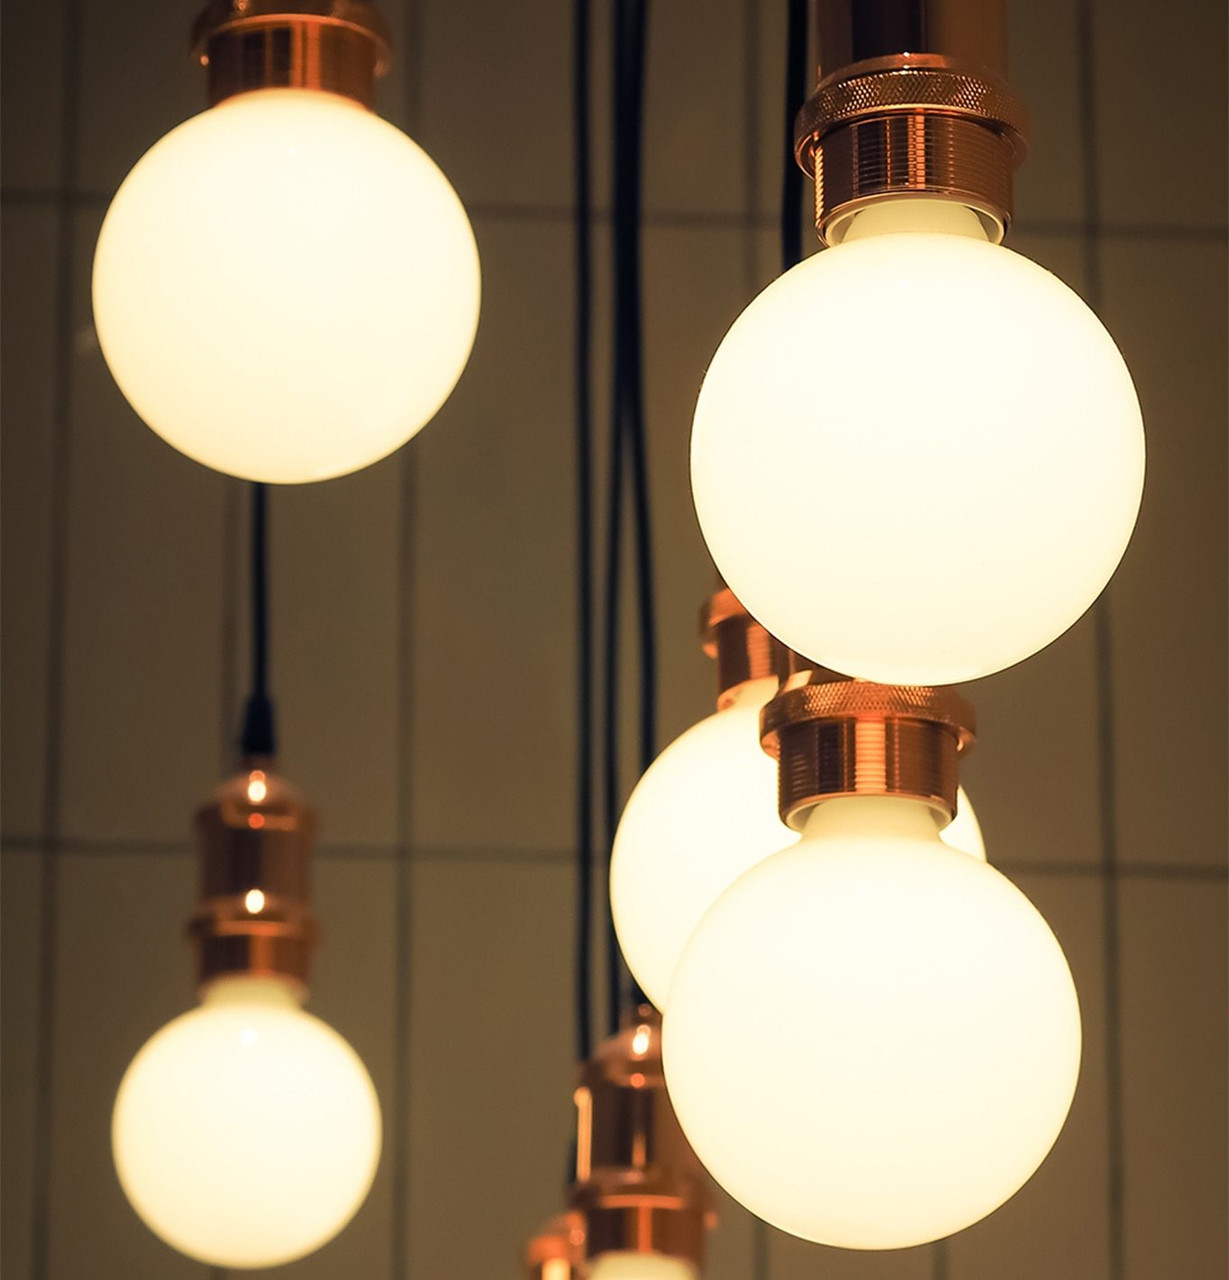 LED Dimmable Globe Large Light Bulbs